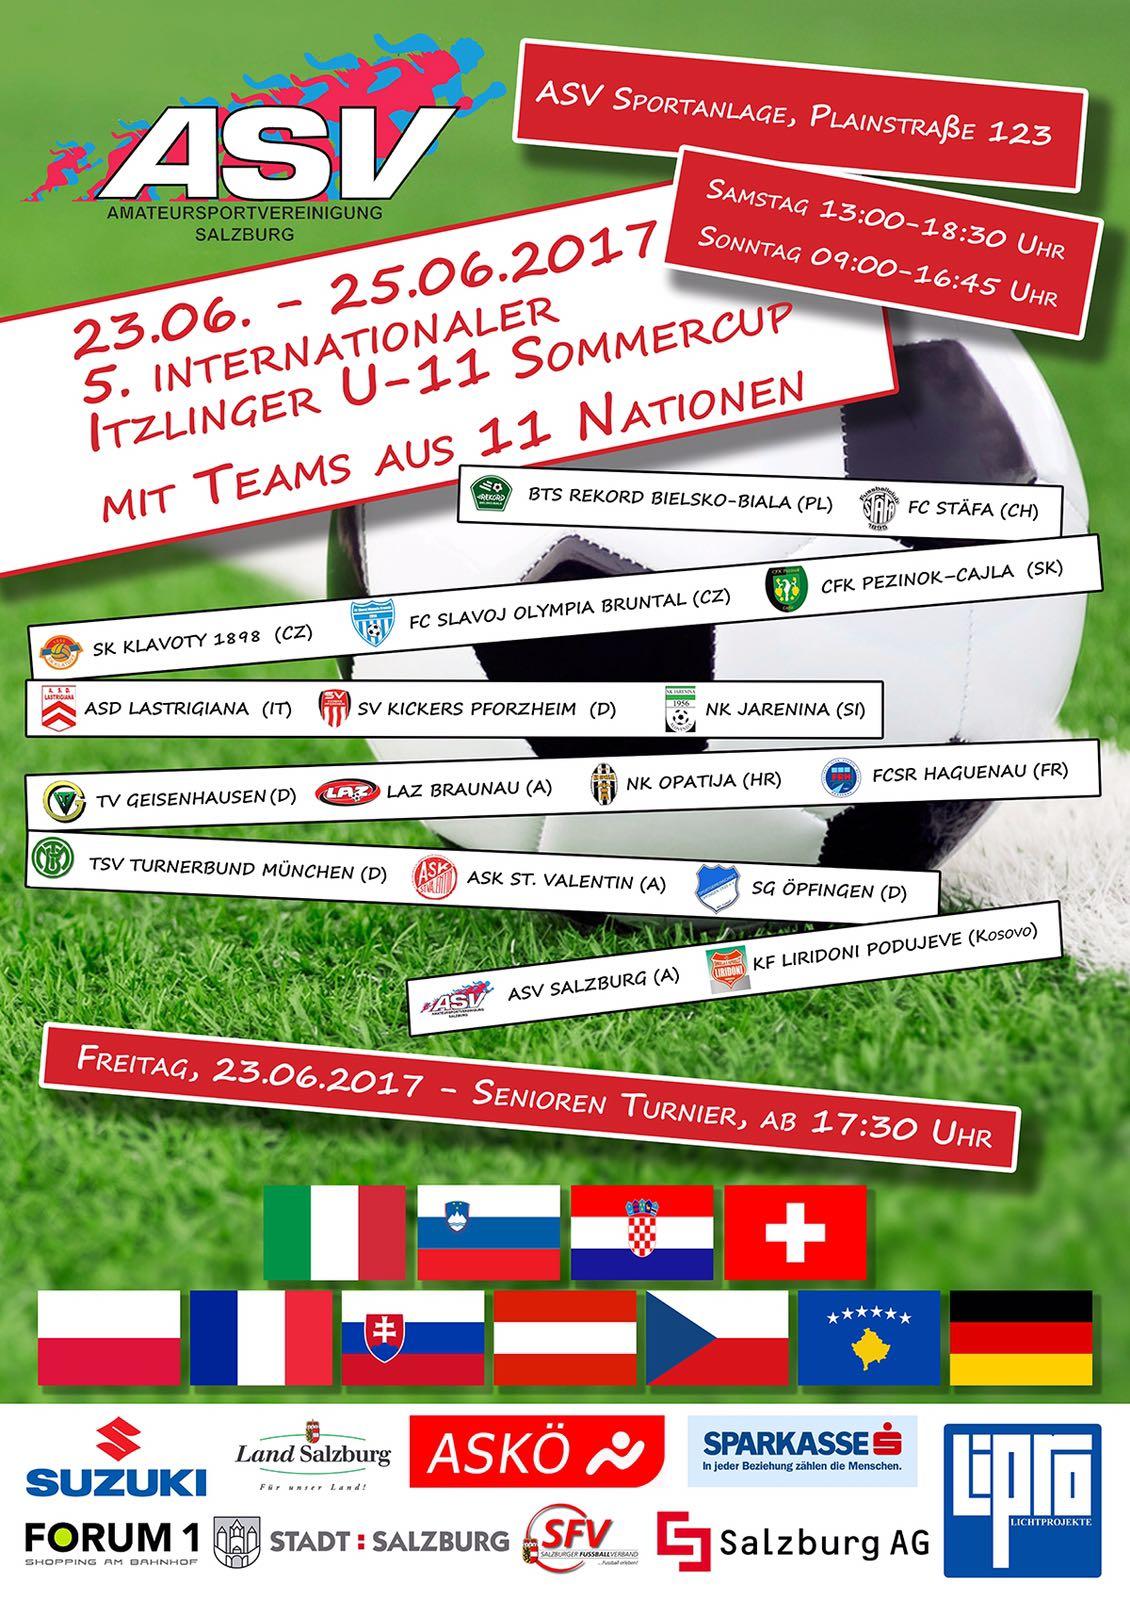 ASV Salzburg Sommercup 2017